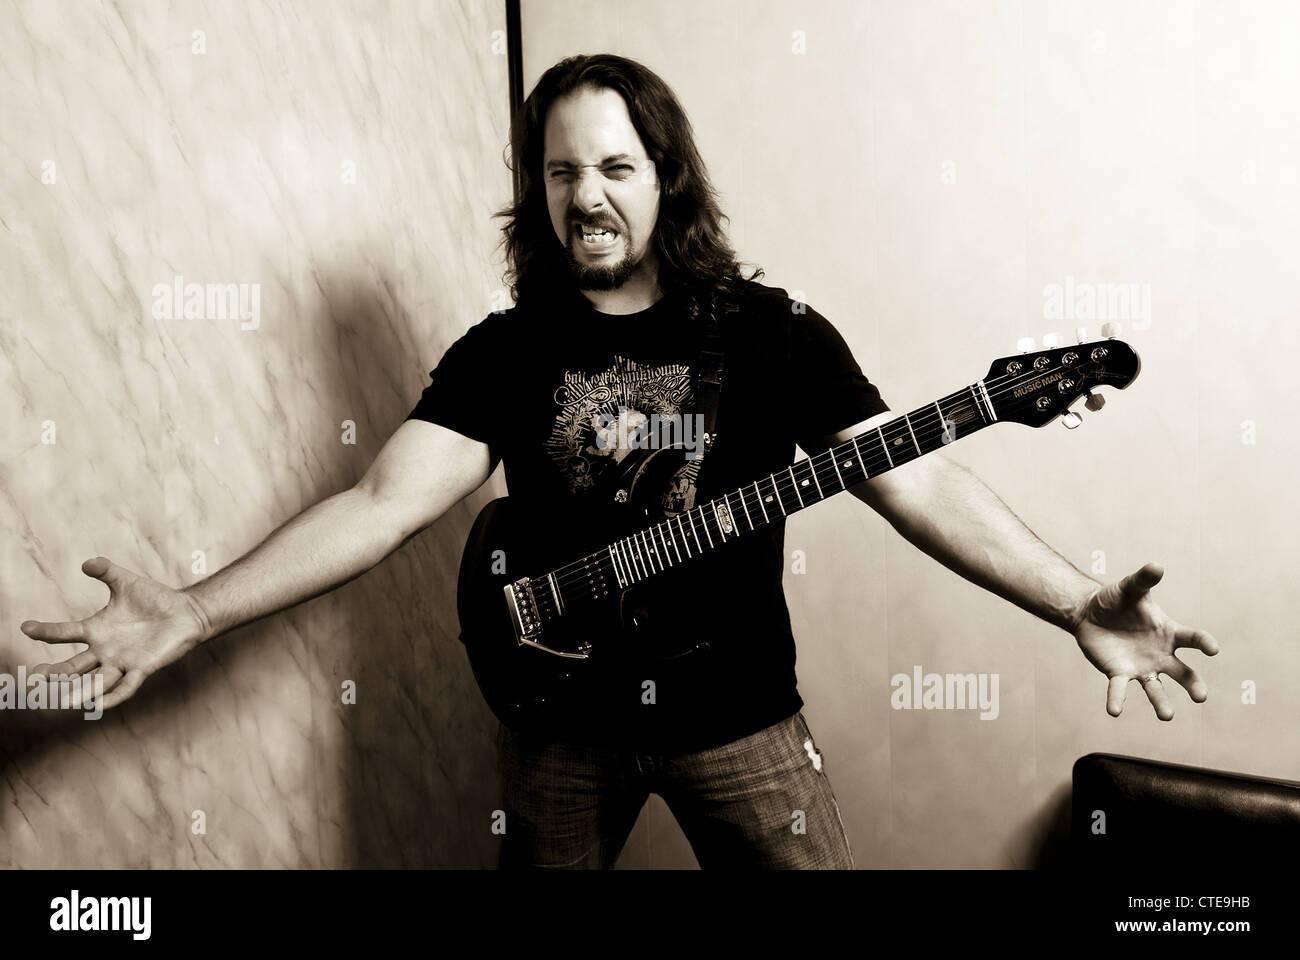 Dream Theater, music, concert, guitarist, John Petrucci, artist, band Dream Theater, American progressive metal - Stock Image